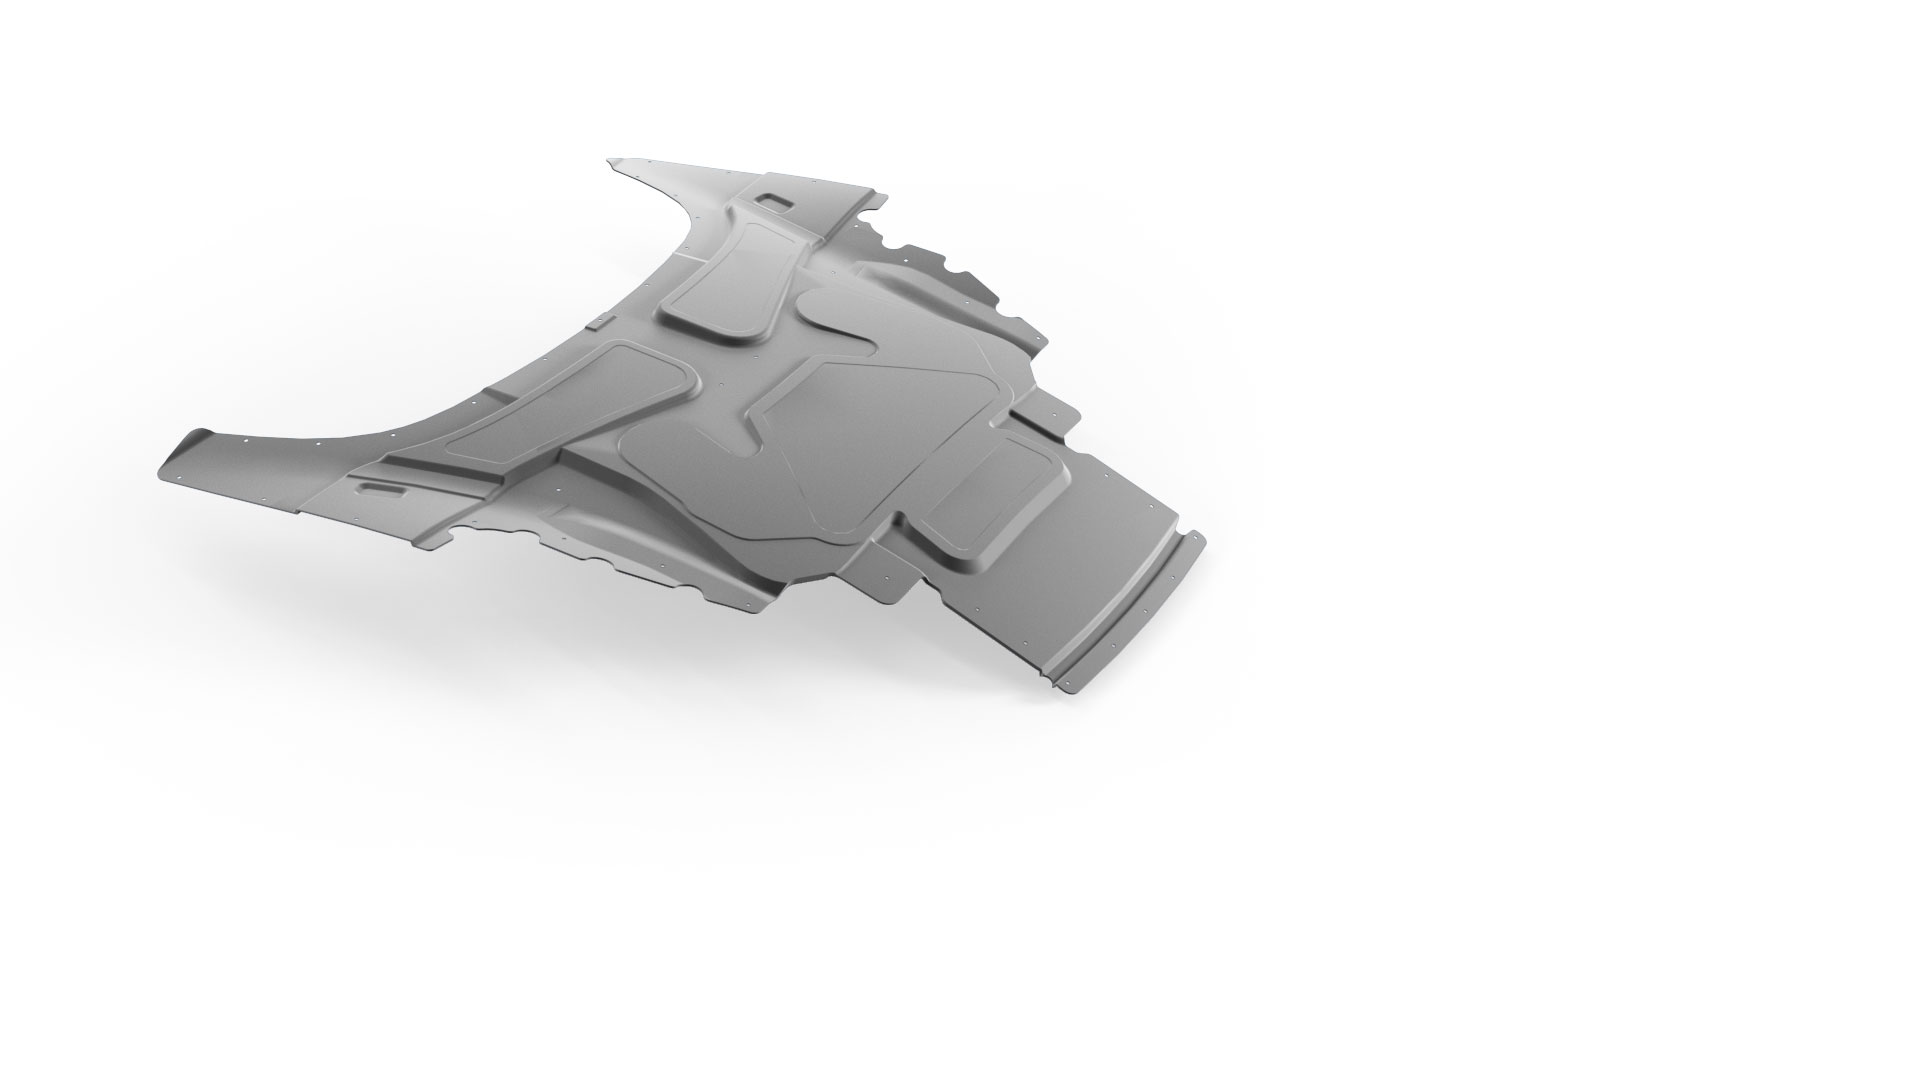 engine-repair-molds-for-automotive-ennegi